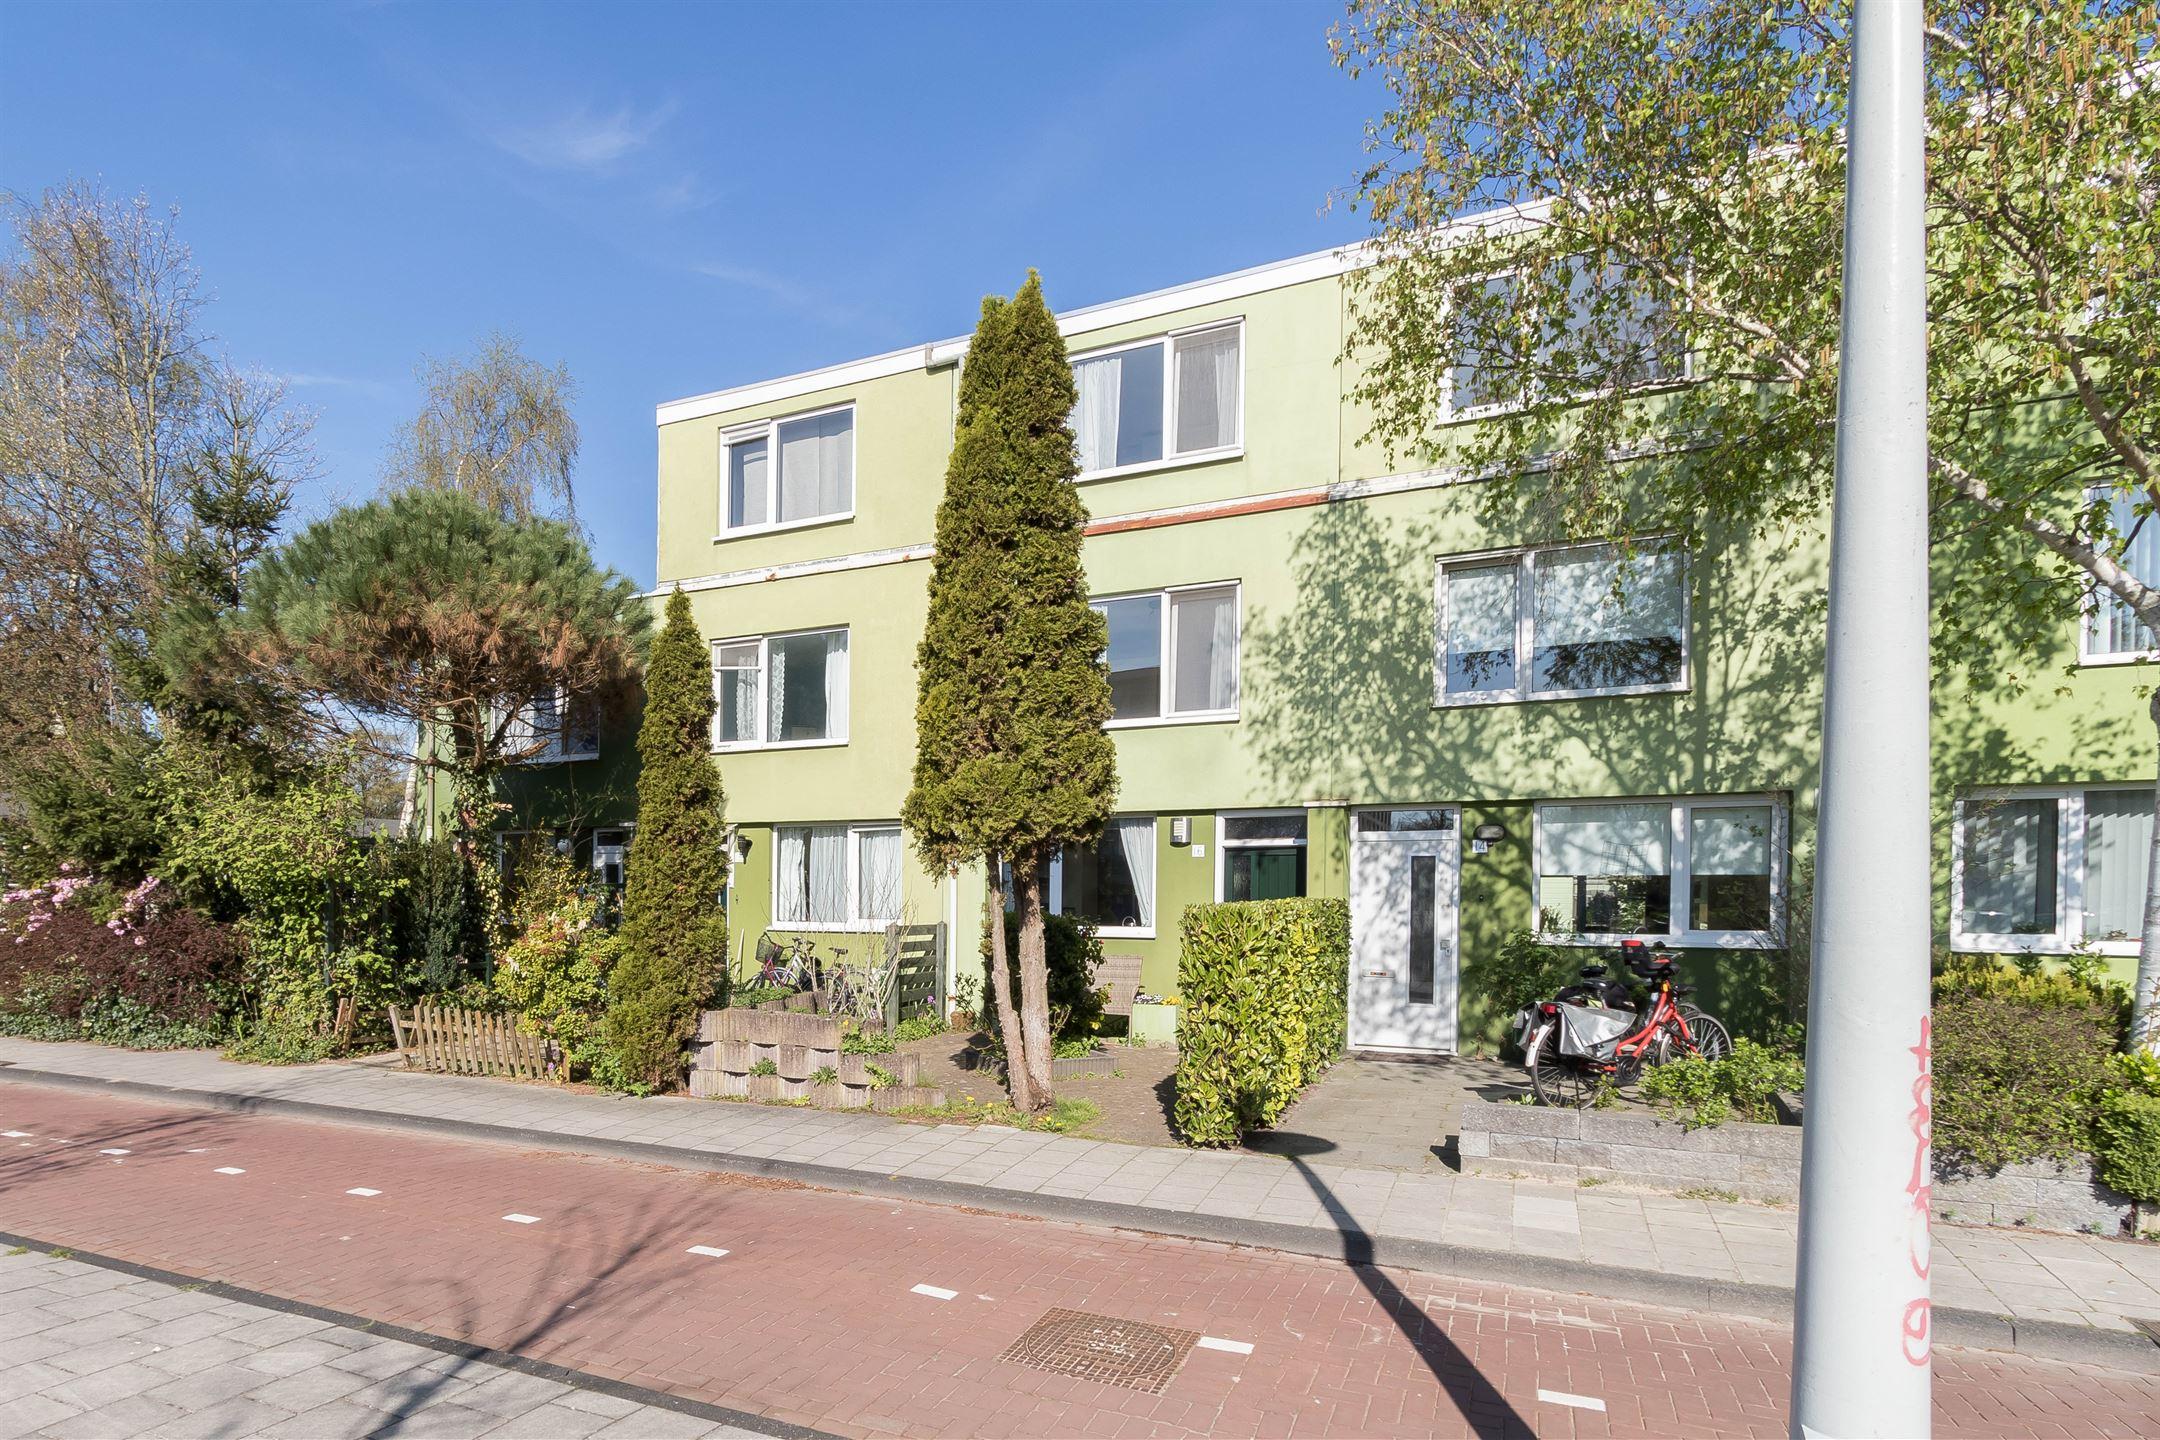 Verkocht ostwaldstraat 16 1097 ja amsterdam funda for Funda amsterdam watergraafsmeer